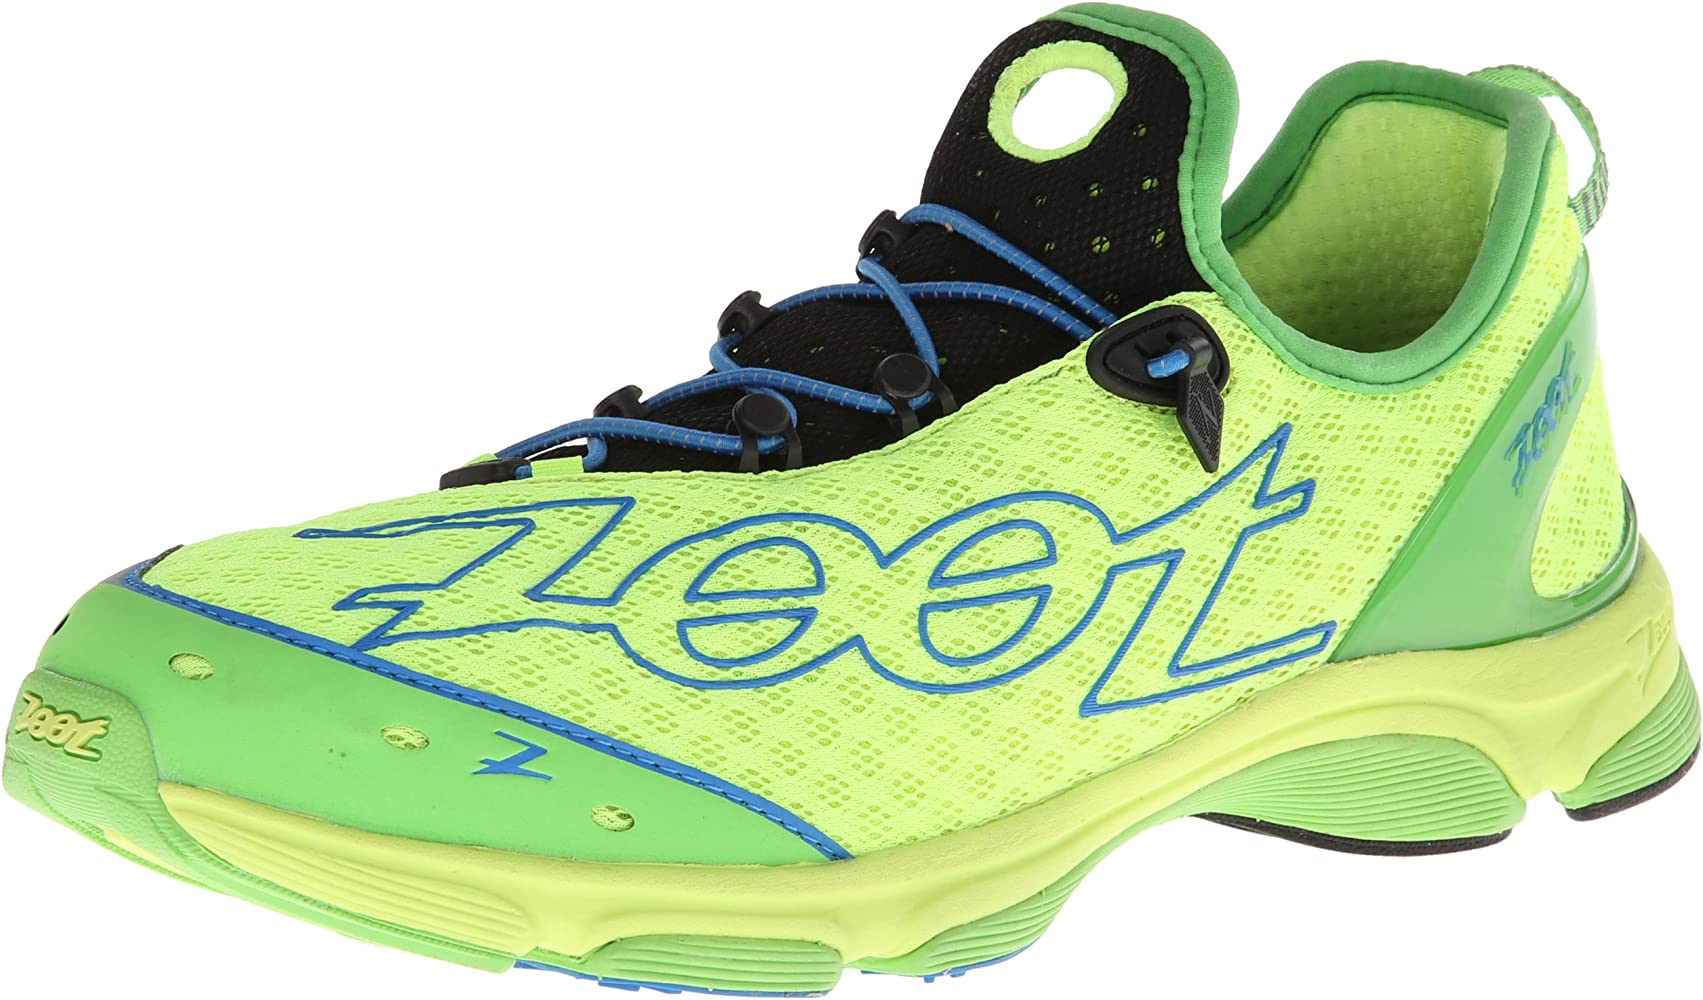 Zoot Men's Ultra TT 7.0 Running Shoe